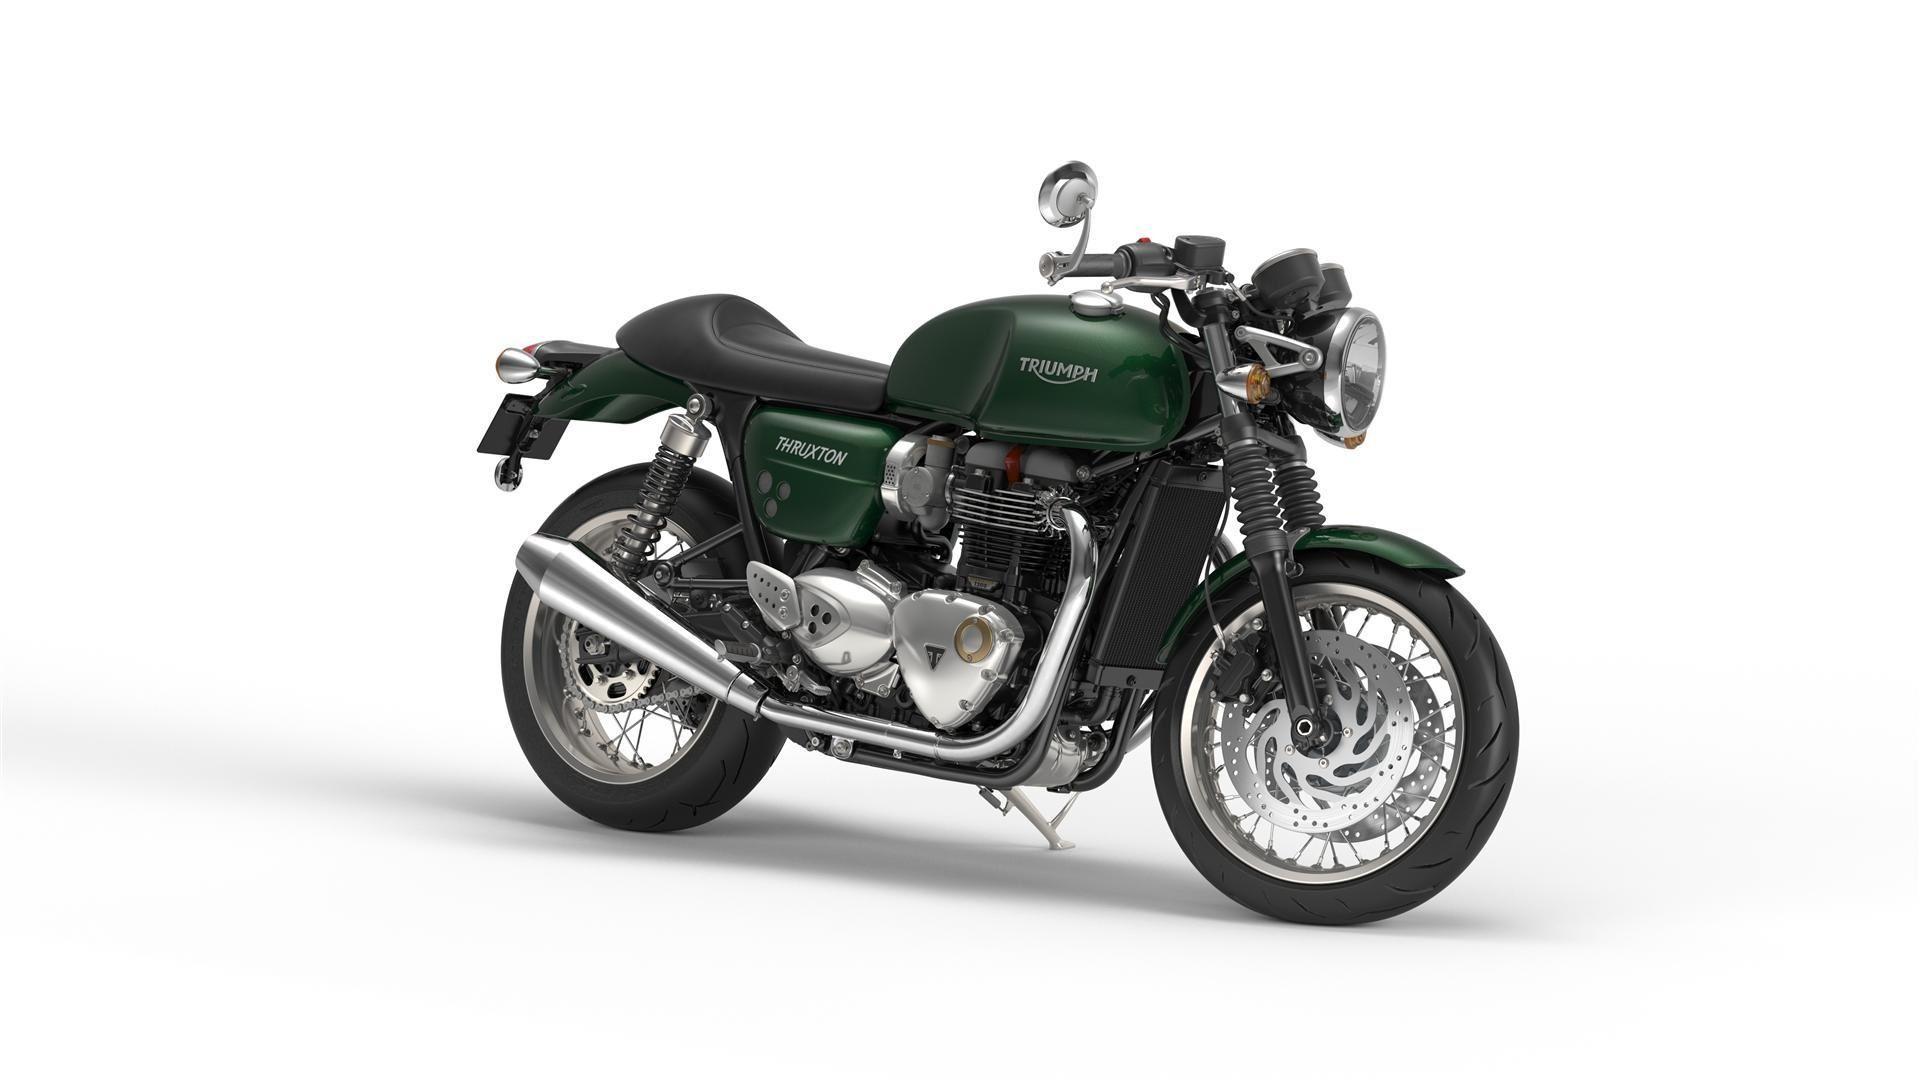 motorrad neufahrzeug kaufen triumph thruxton 1200 abs moto. Black Bedroom Furniture Sets. Home Design Ideas